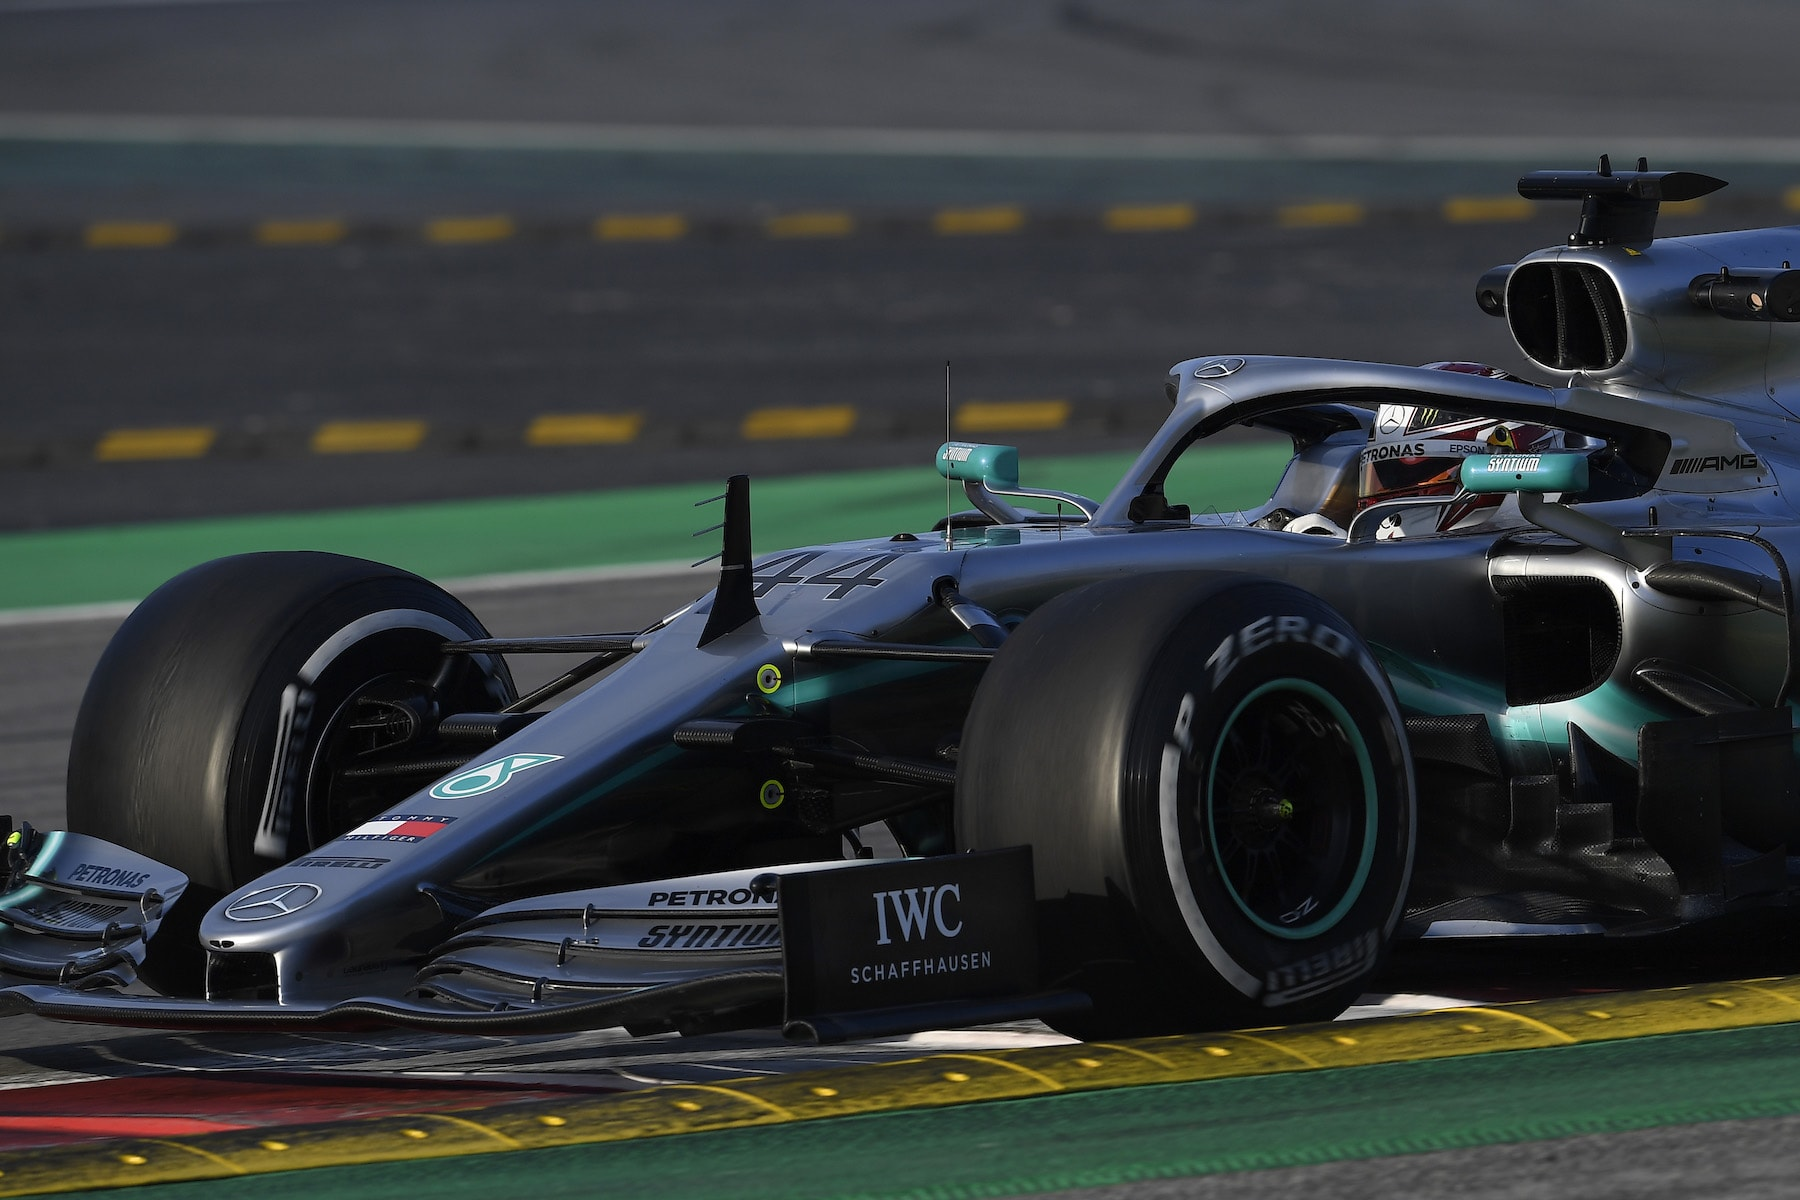 2019 Lewis Hamilton   Mercedes W10   2019 Barcelona T1 D2 1 copy.jpg